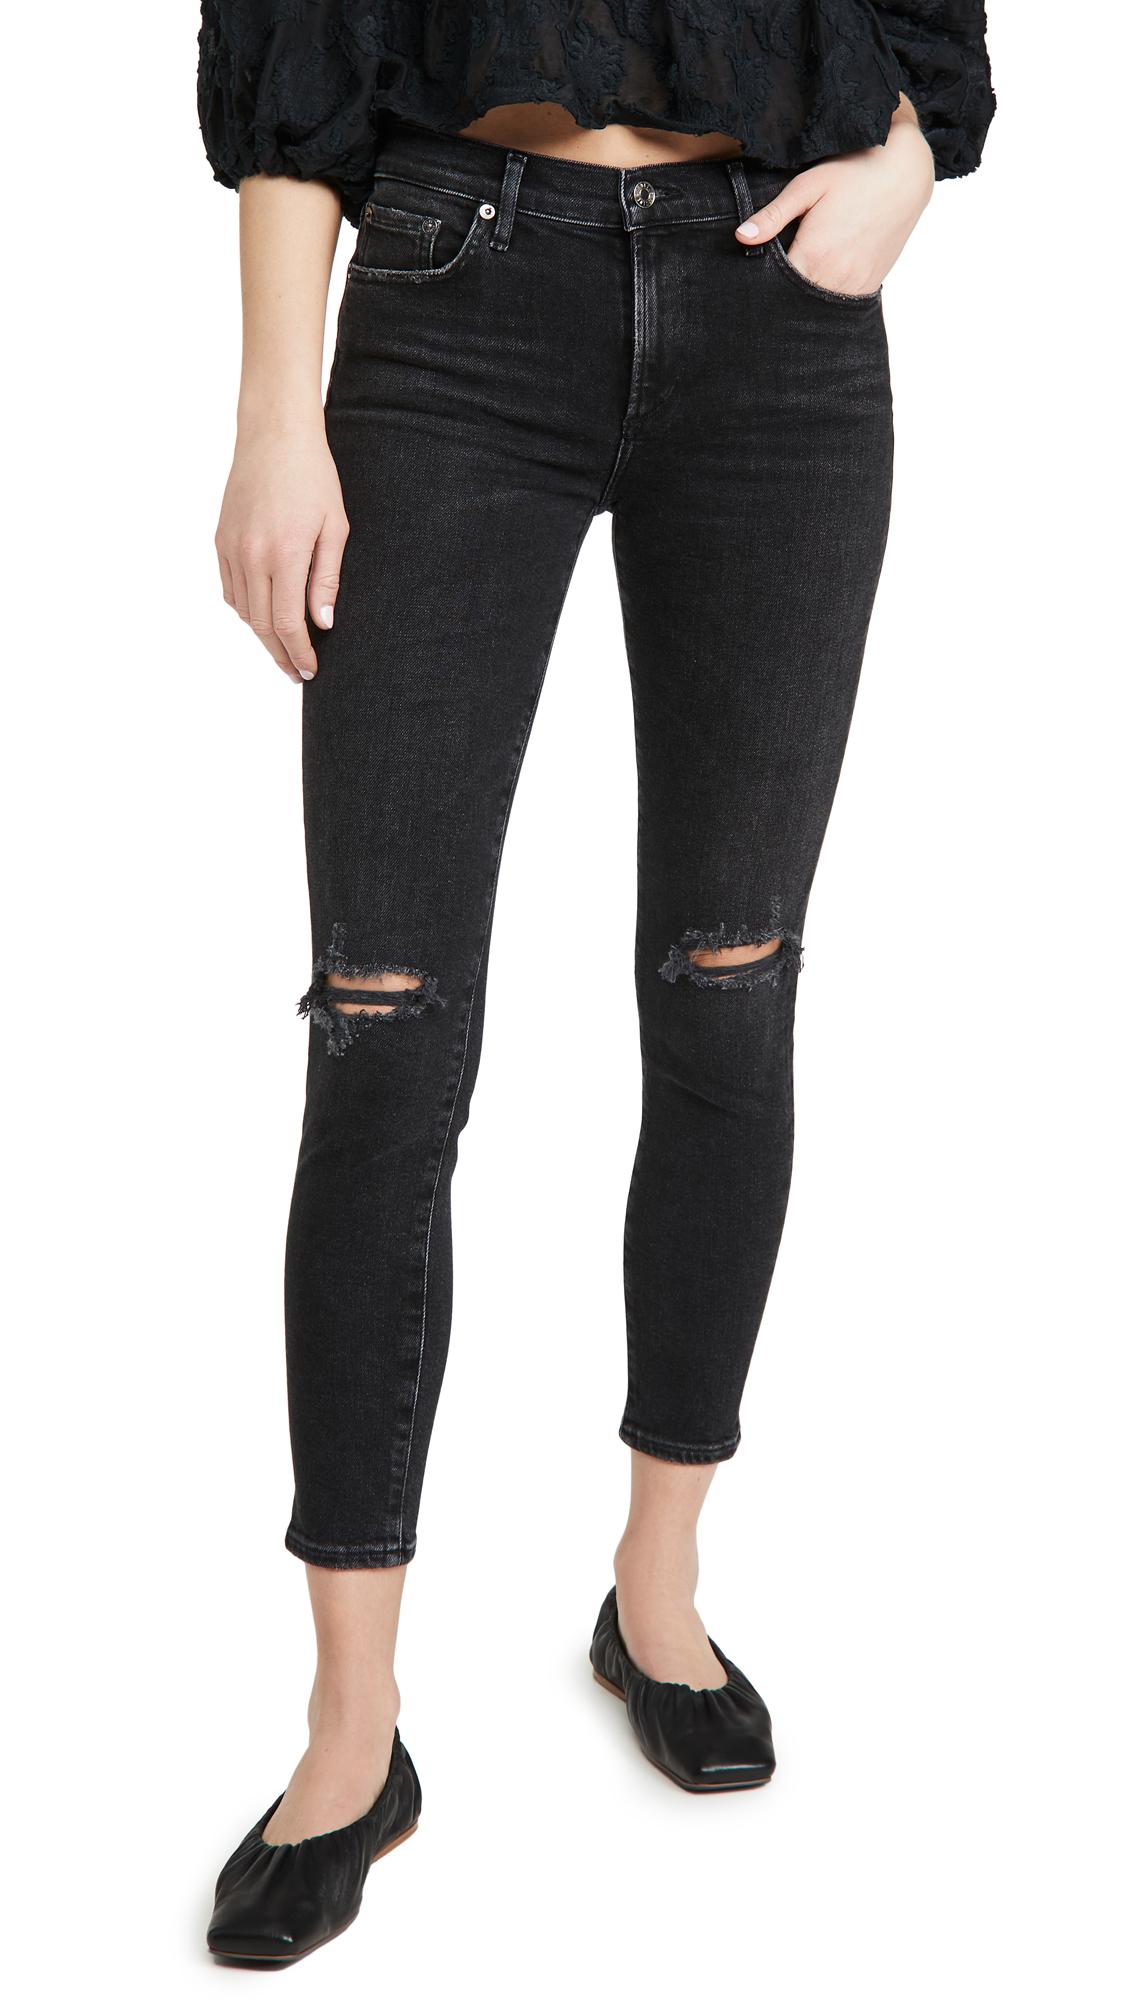 AGOLDE Sophie Ankle Jeans